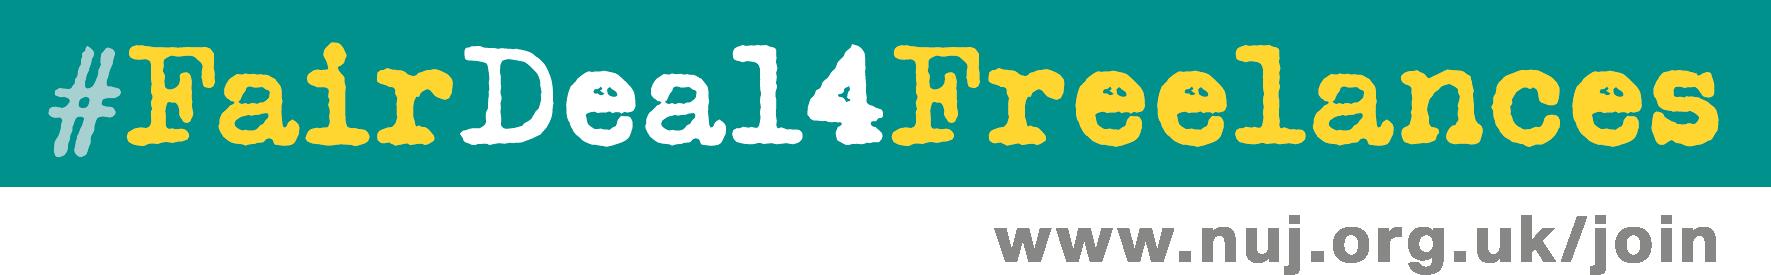 #FairDeal4Freelances banner